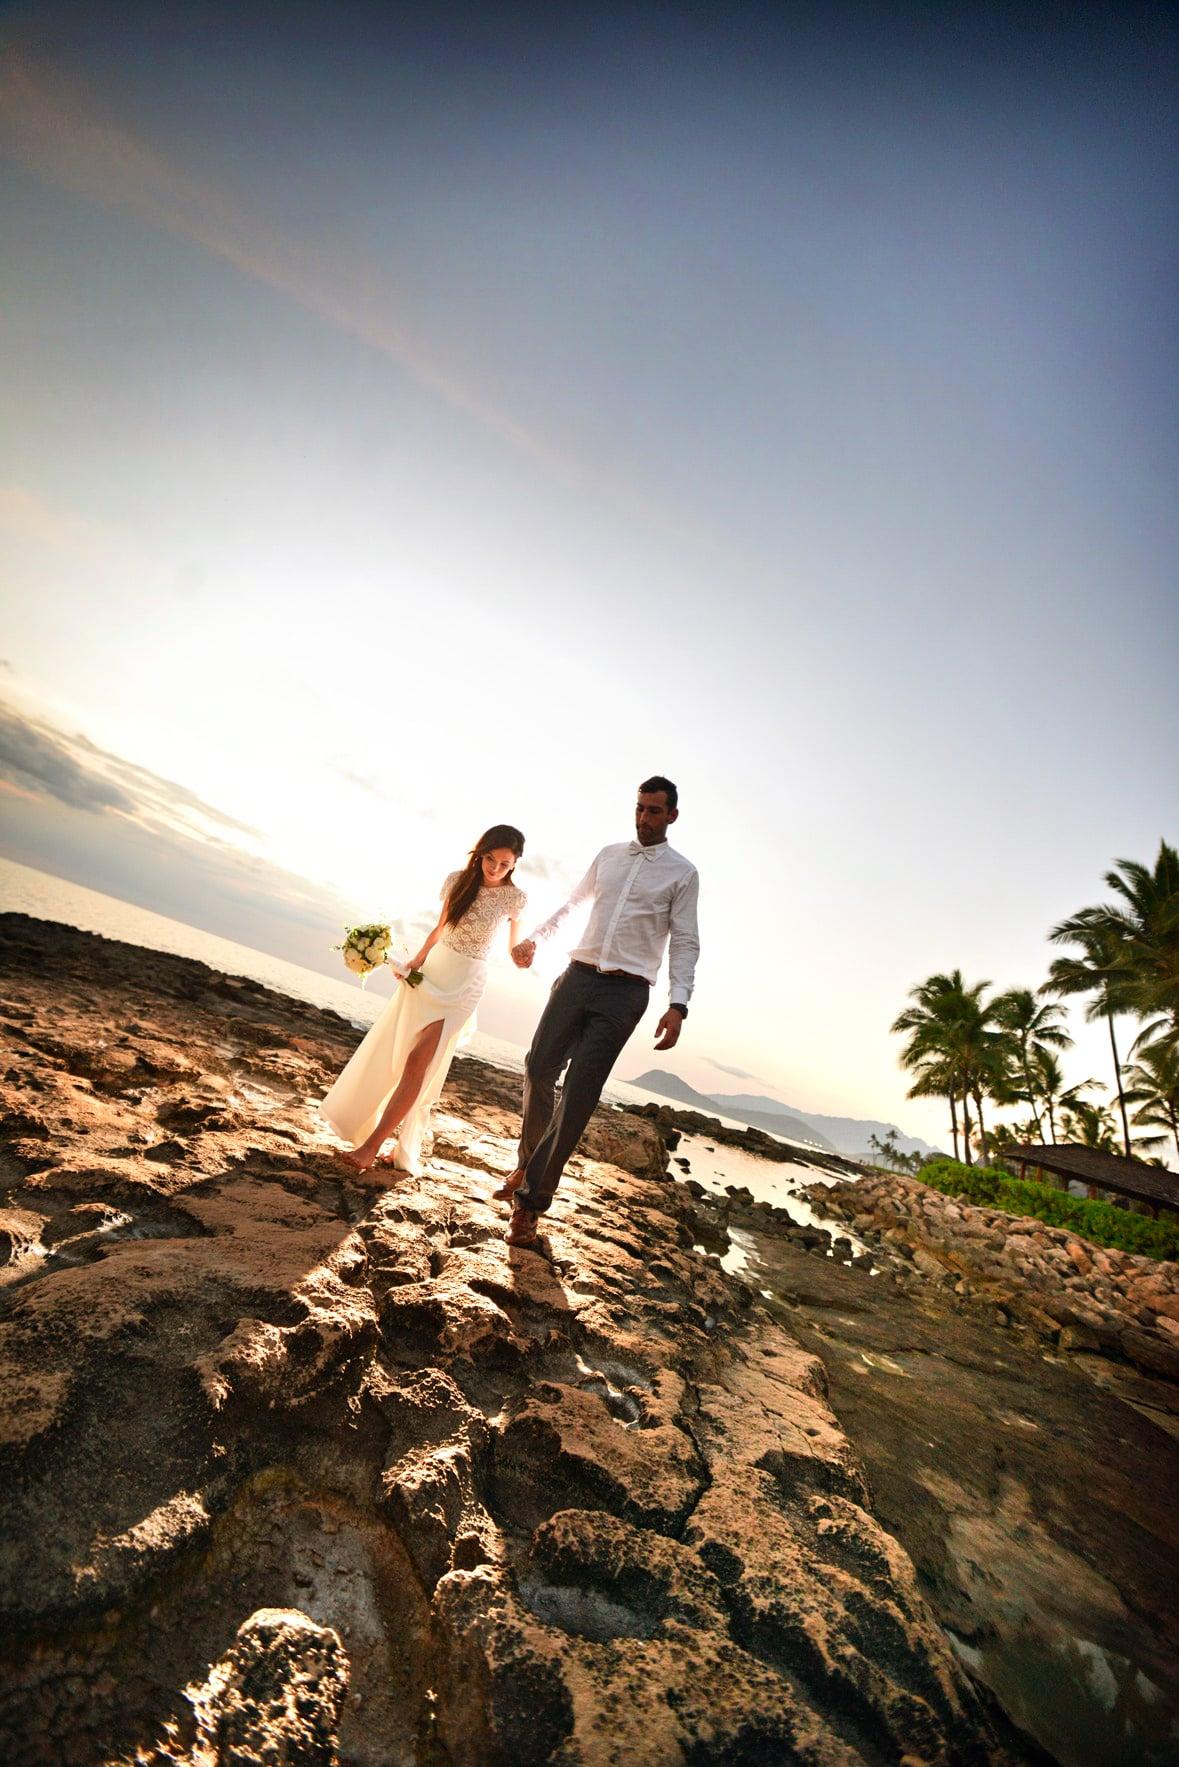 lanikuhonua beach wedding oahu hawaii stephen ludwig026.jpg